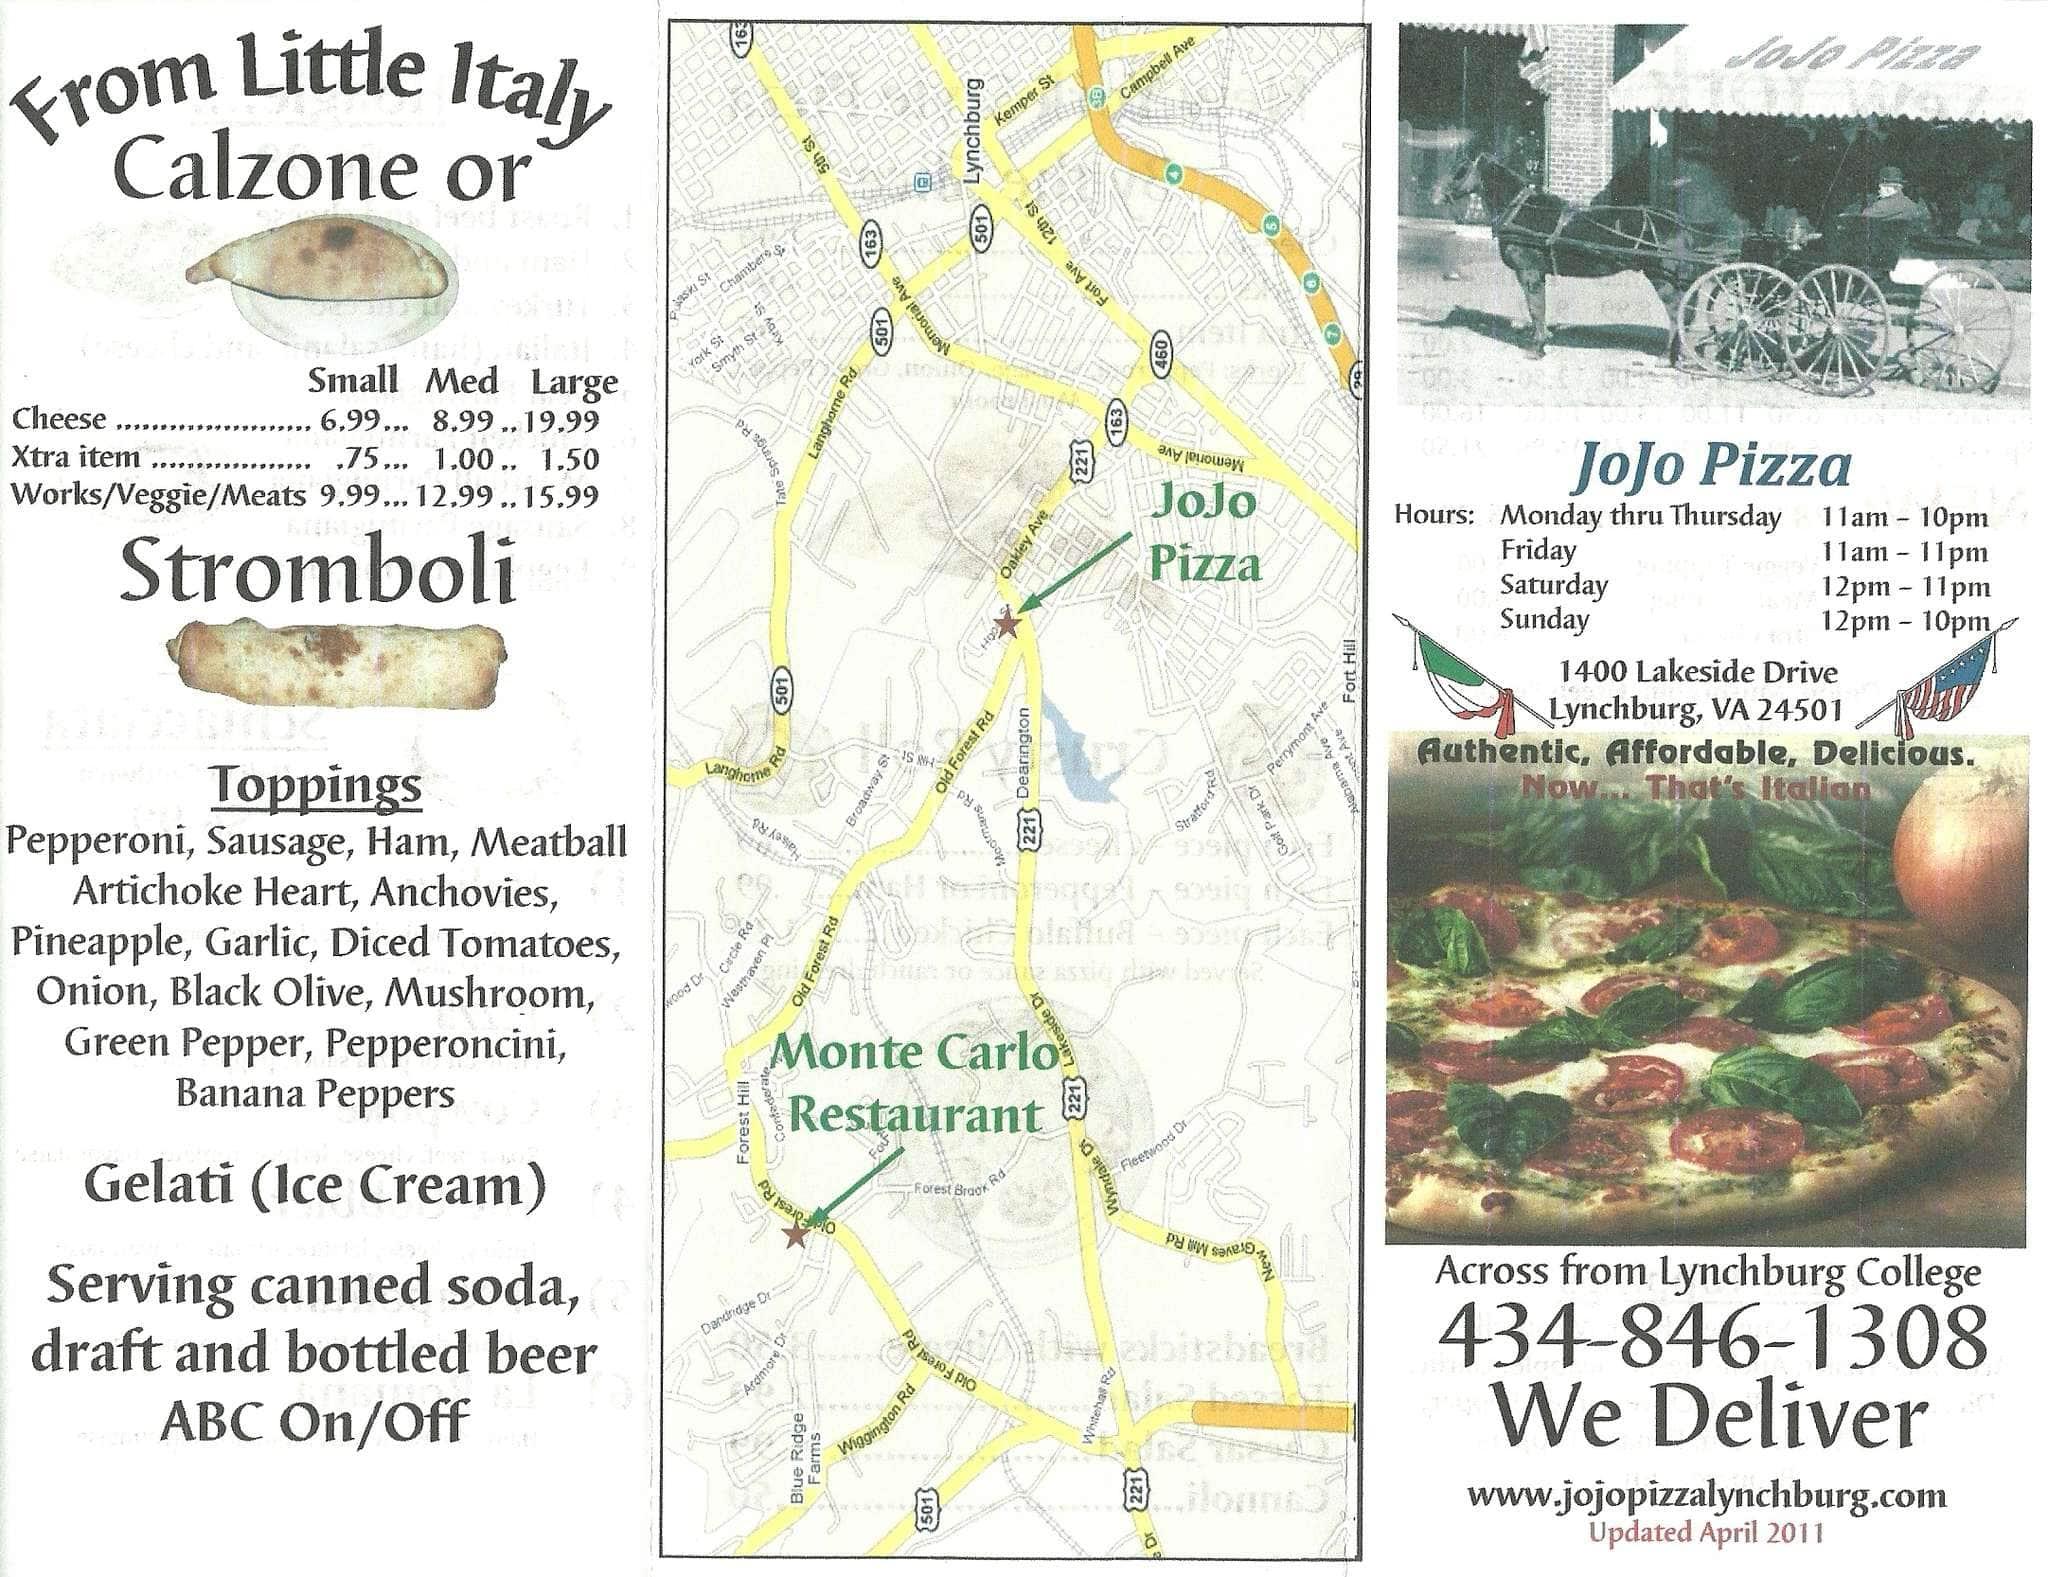 Jojo Pizza Menu, Menu for Jojo Pizza, Lynchburg, Lynchburg ...